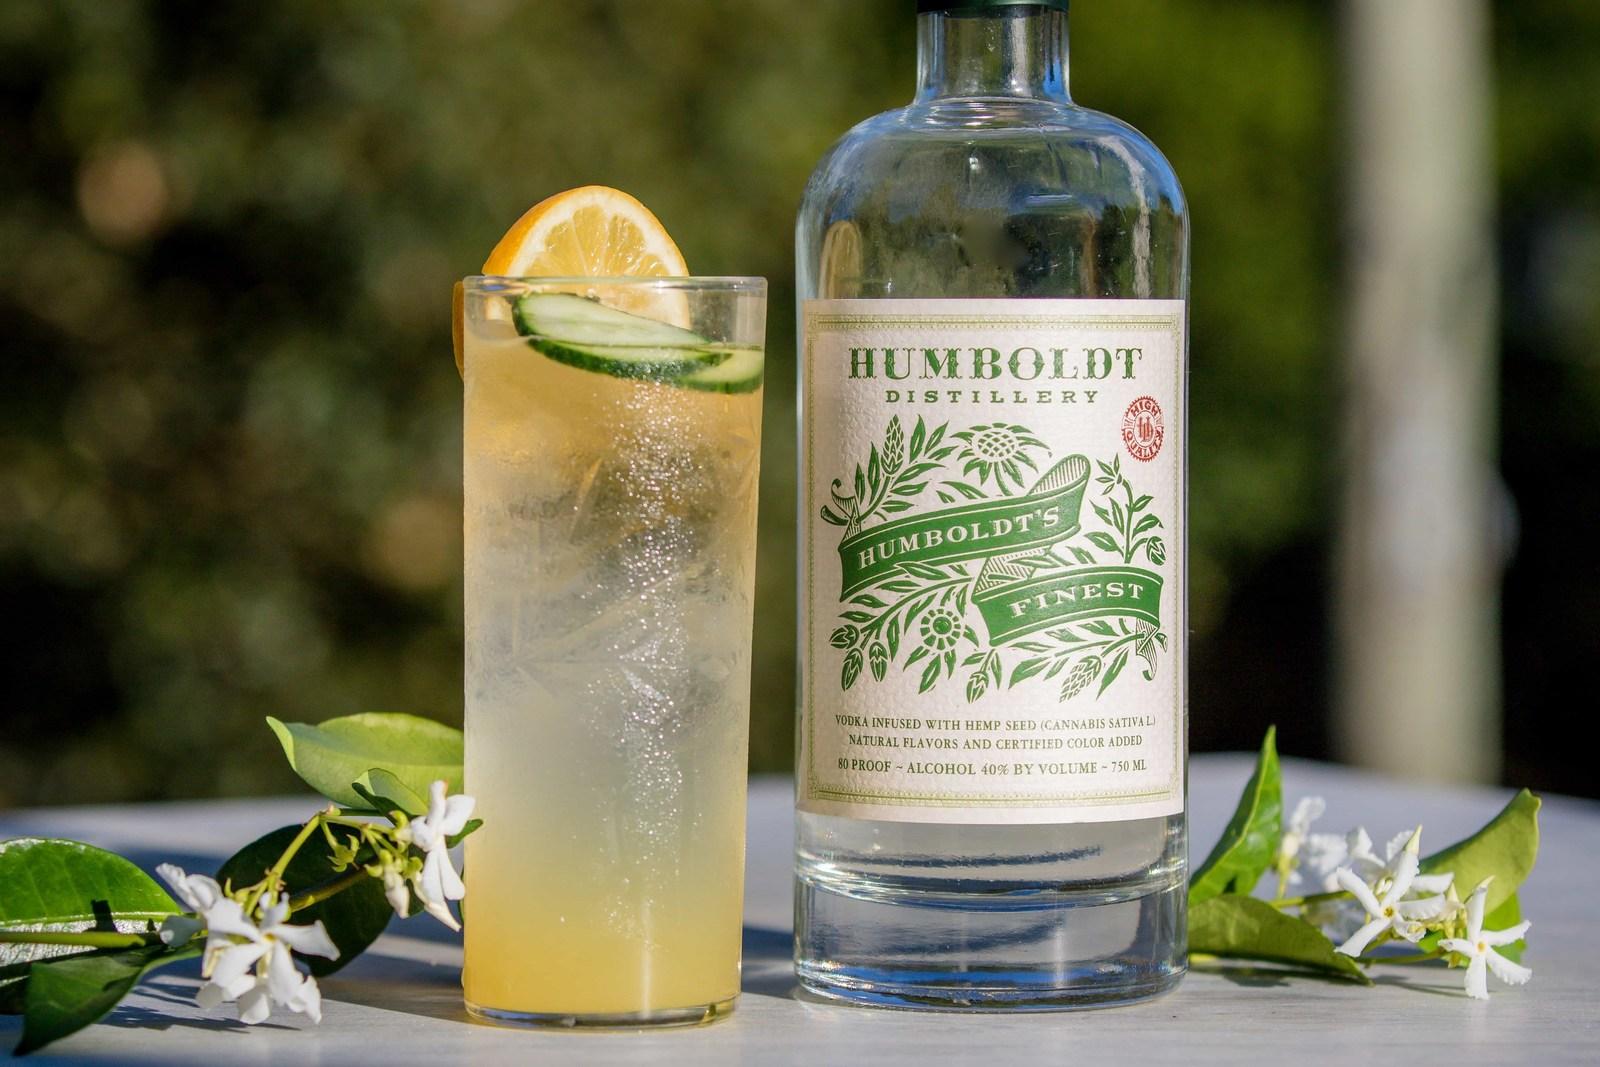 Humboldt Distillery Celebrates 4/20 With Cannabis-Infused Vodka